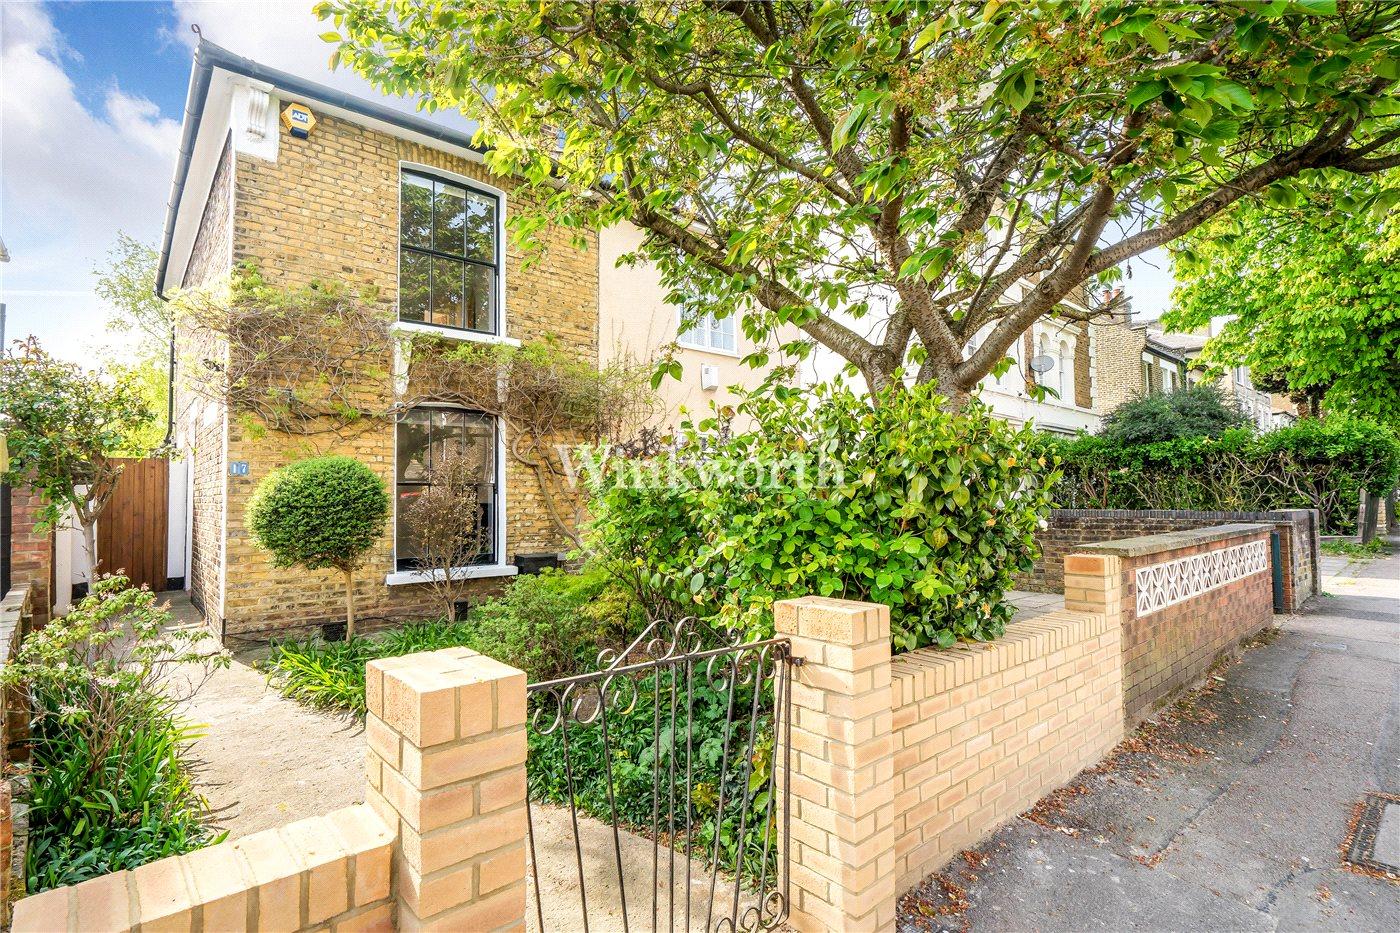 Summerhill Rd, London N15, UK - Source: Winkworth